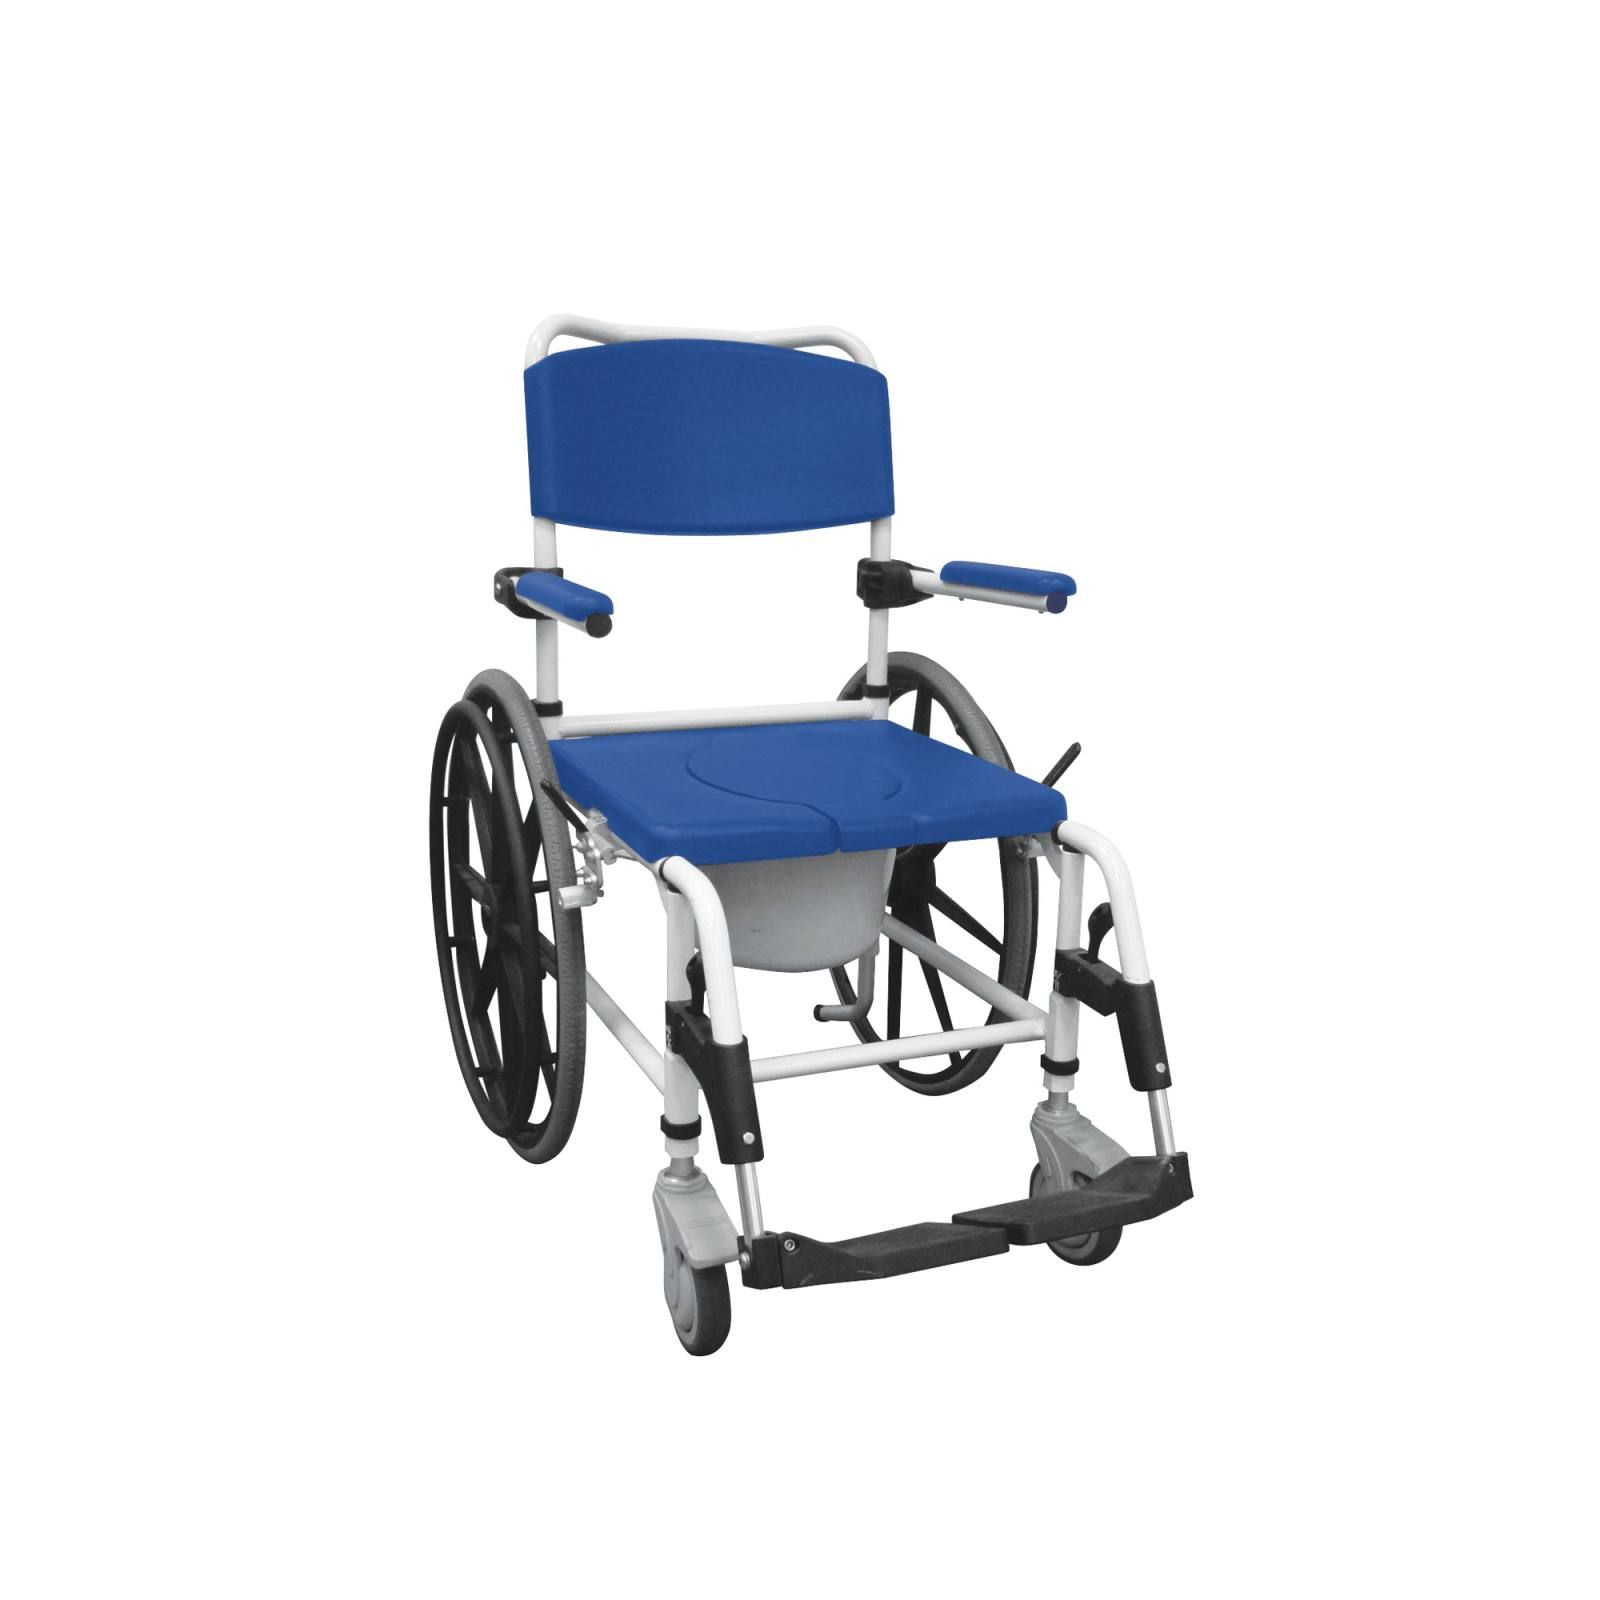 Aluminum Shower Commode Mobile Chair Shower Commode Chair Shower Wheelchair Commode Chair